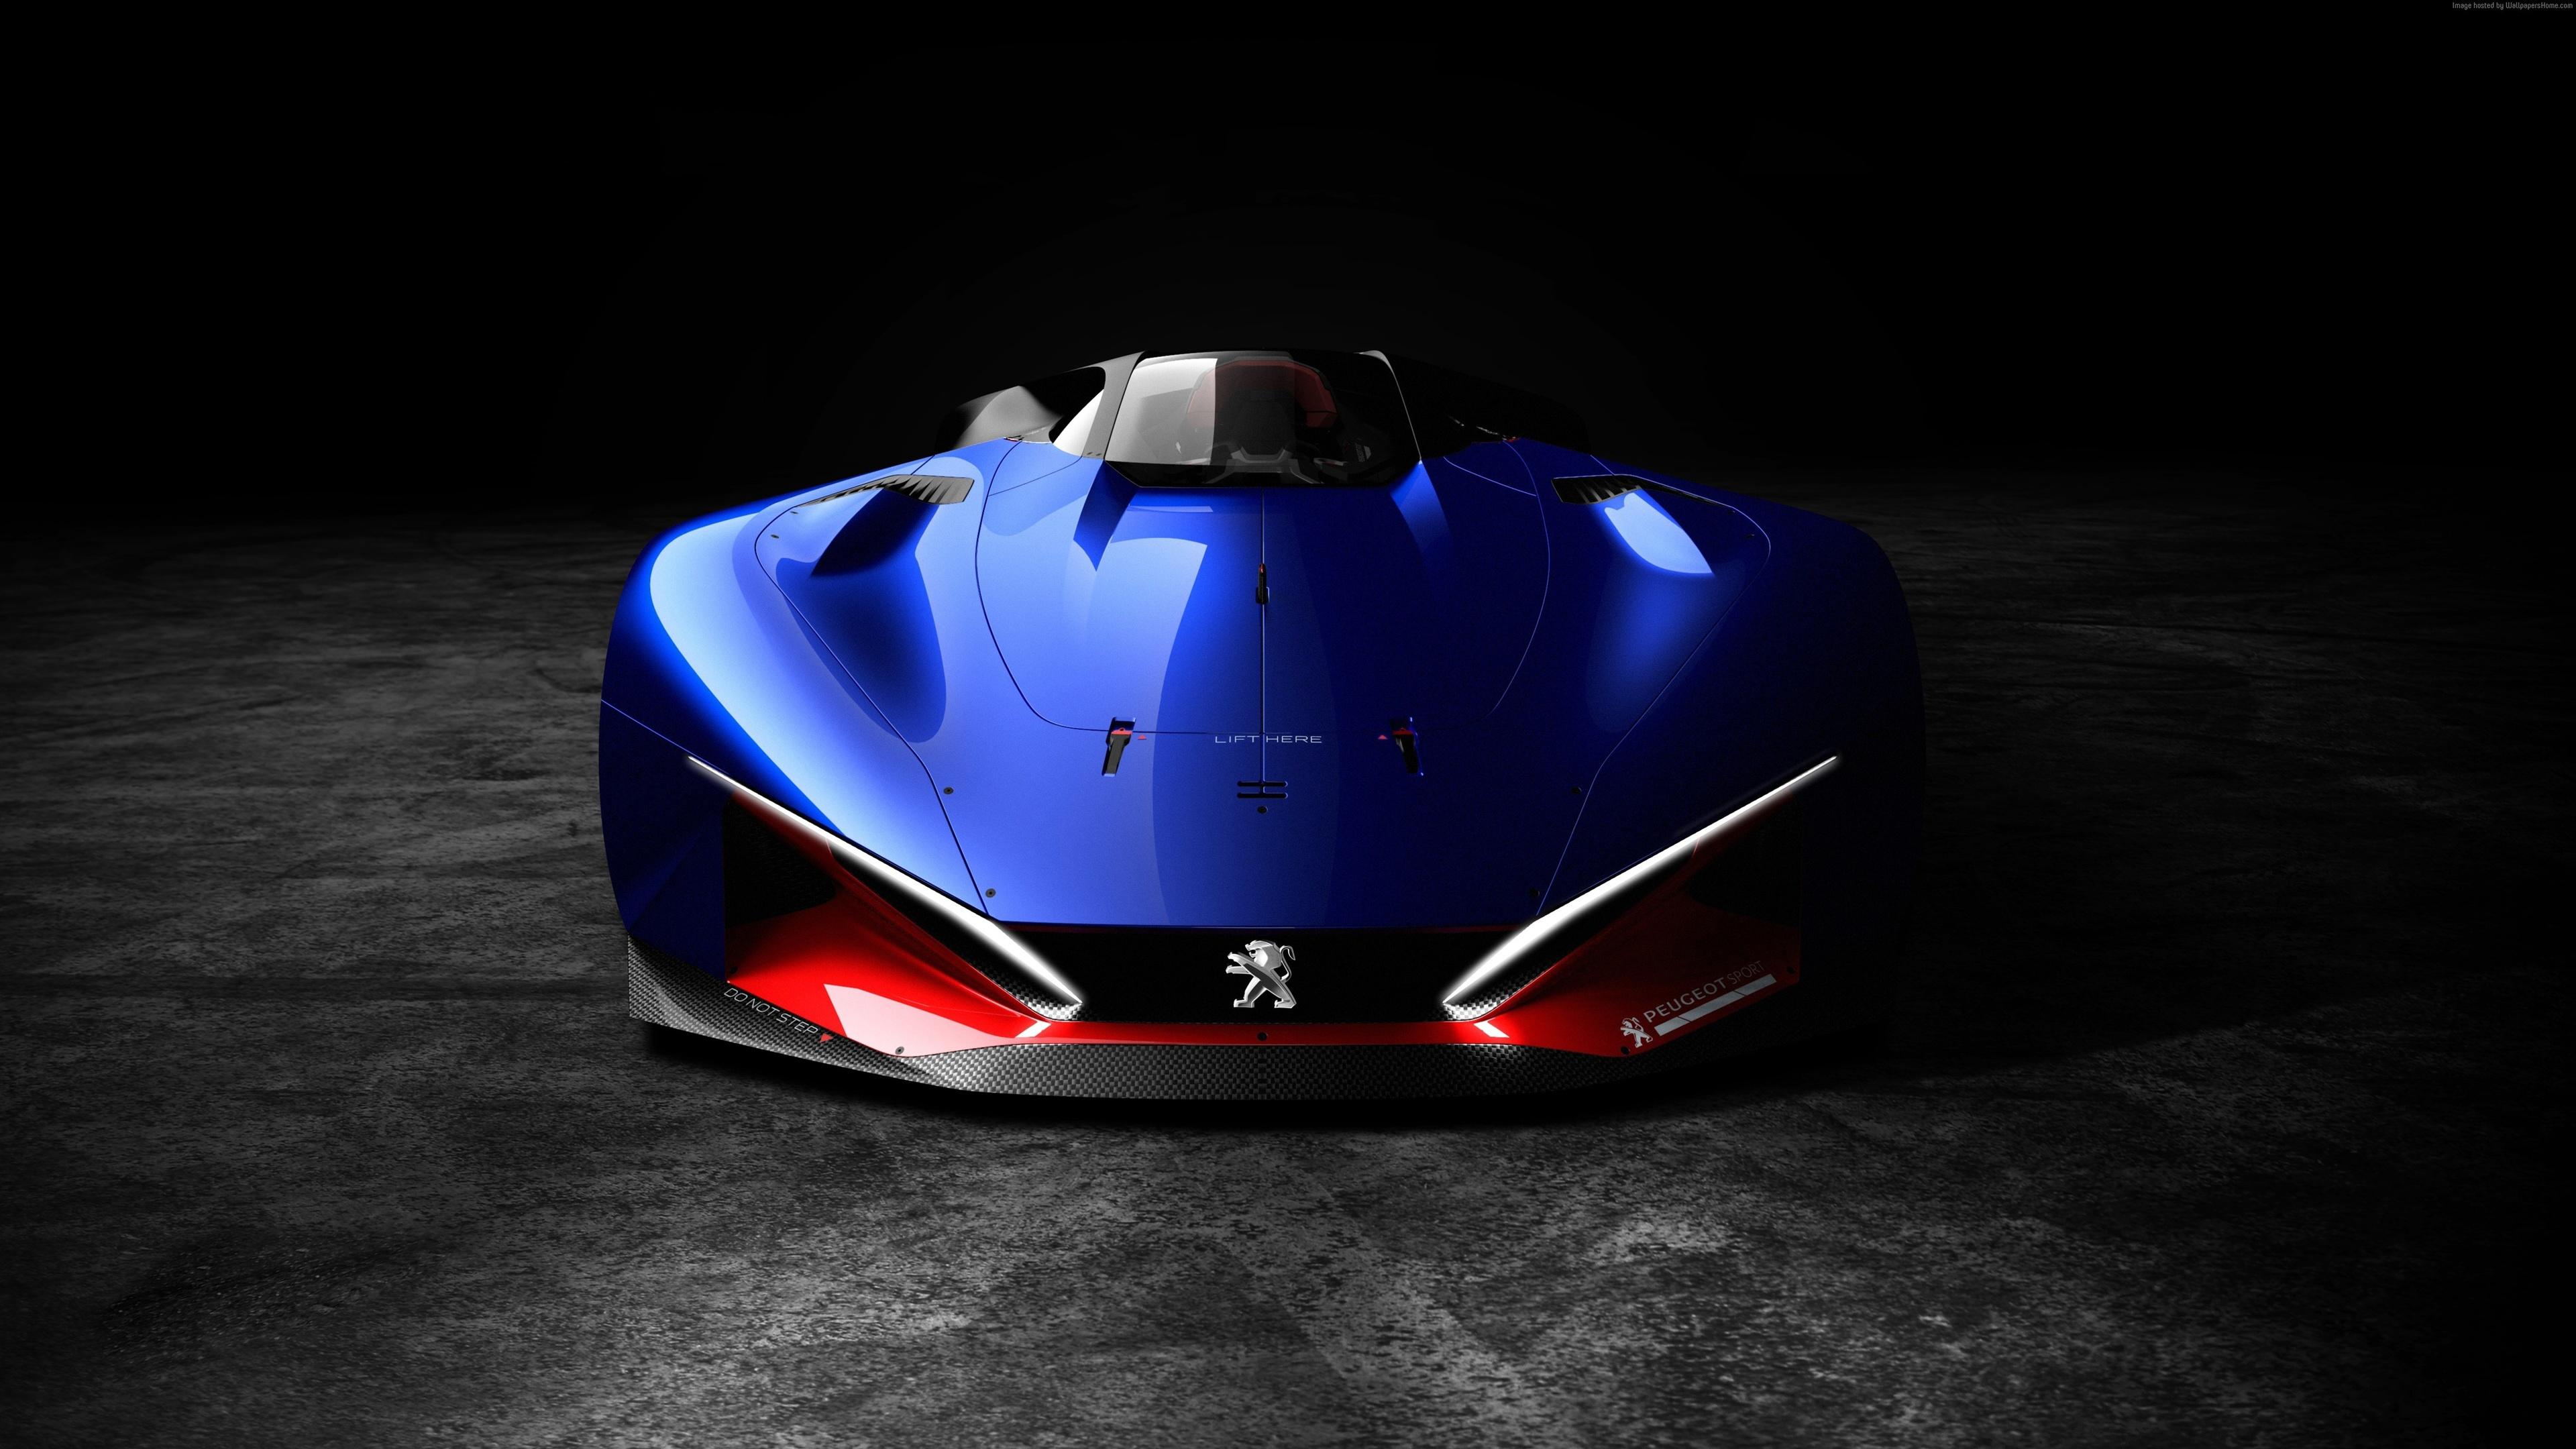 2016 peugeot l500 r concept car 1539104763 - 2016 Peugeot L500 R Concept Car - peugeot wallpapers, concept cars wallpapers, cars wallpapers, 2016 cars wallpapers